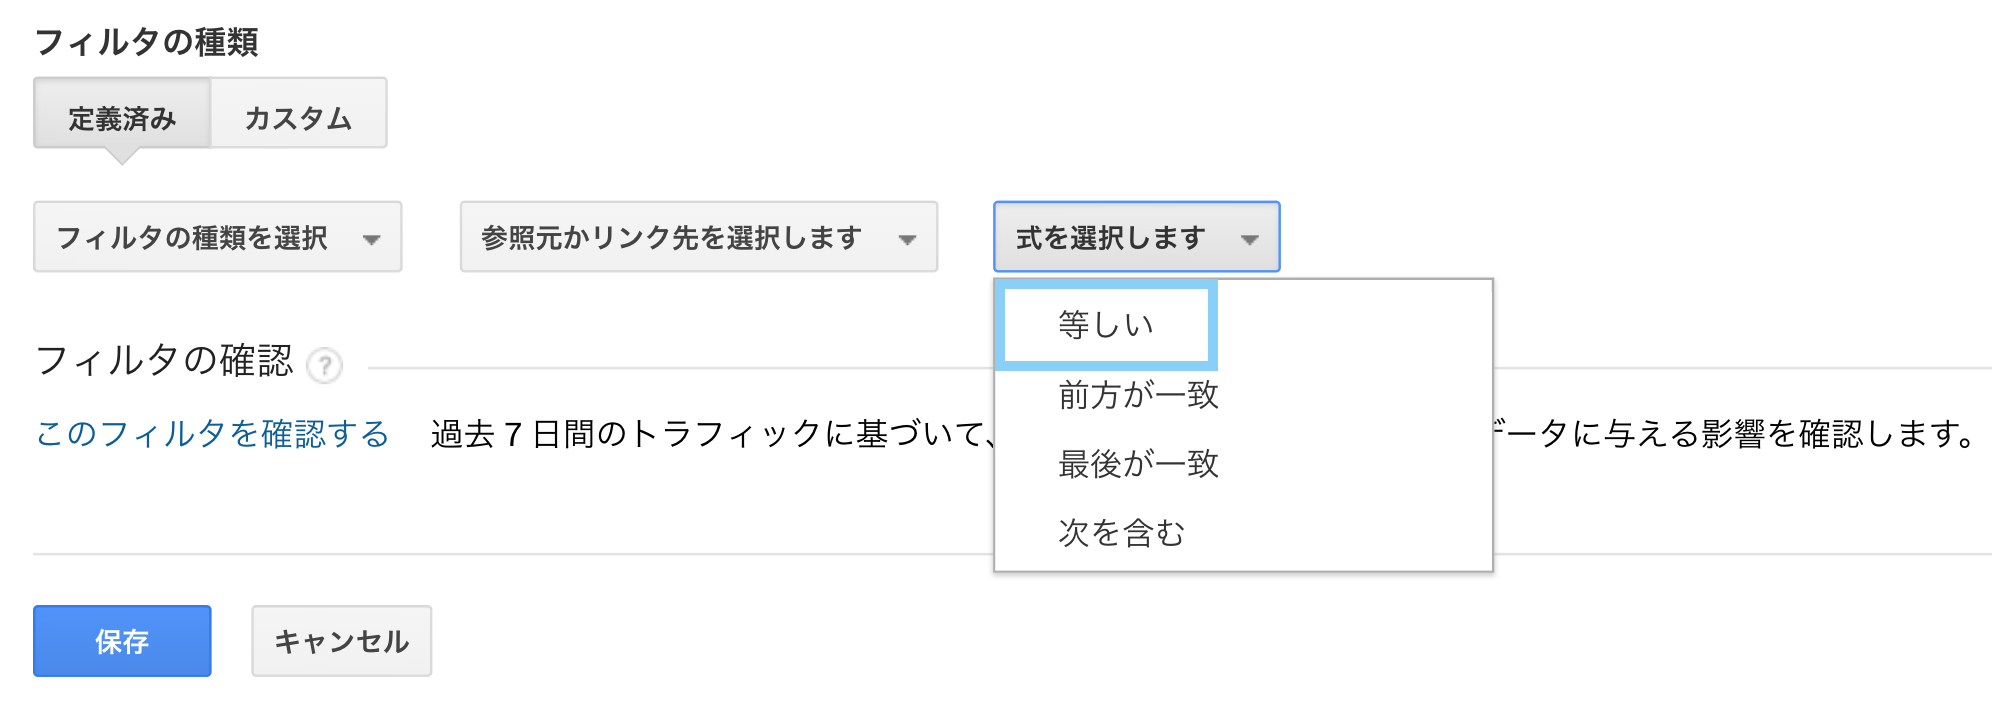 Googleアナリティクスの「式を選択します」で「等しい」を選択する